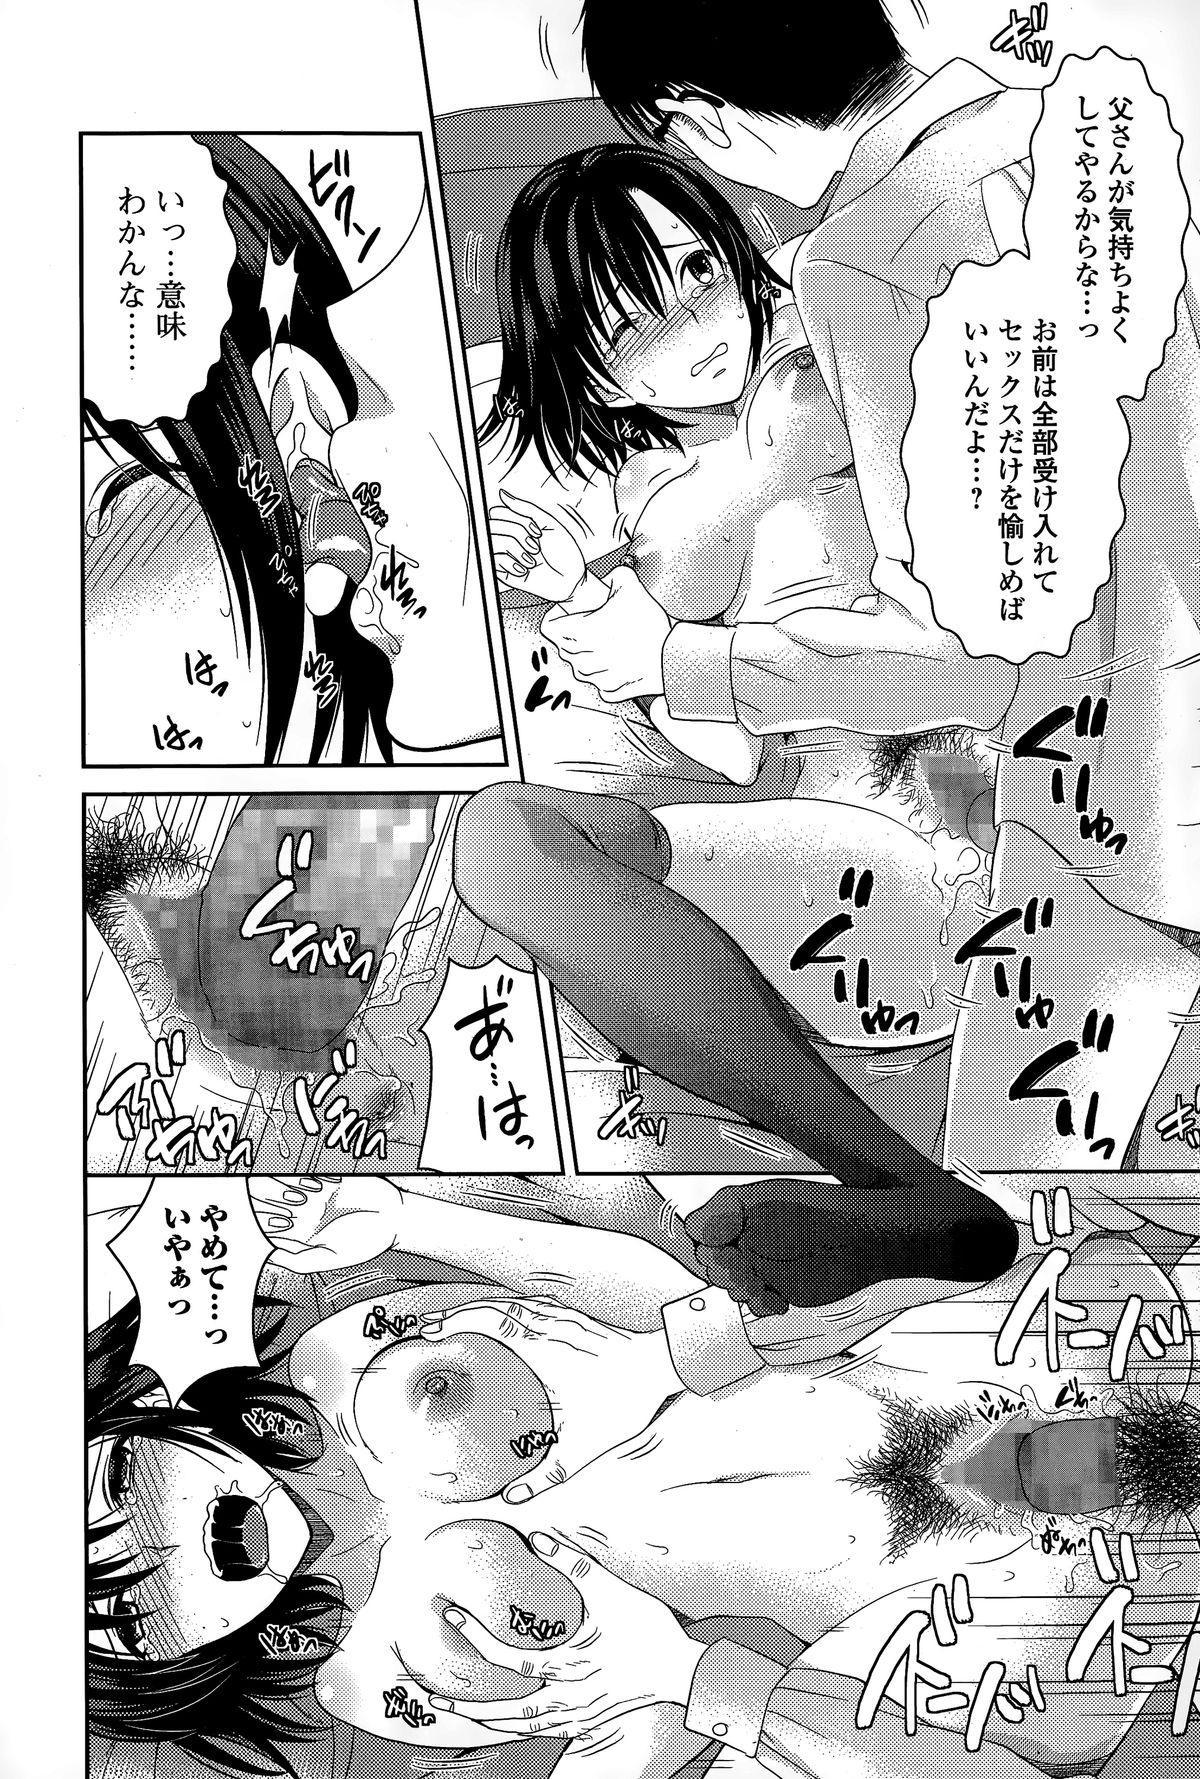 Comic Toutetsu 2015-02 Vol. 3 155